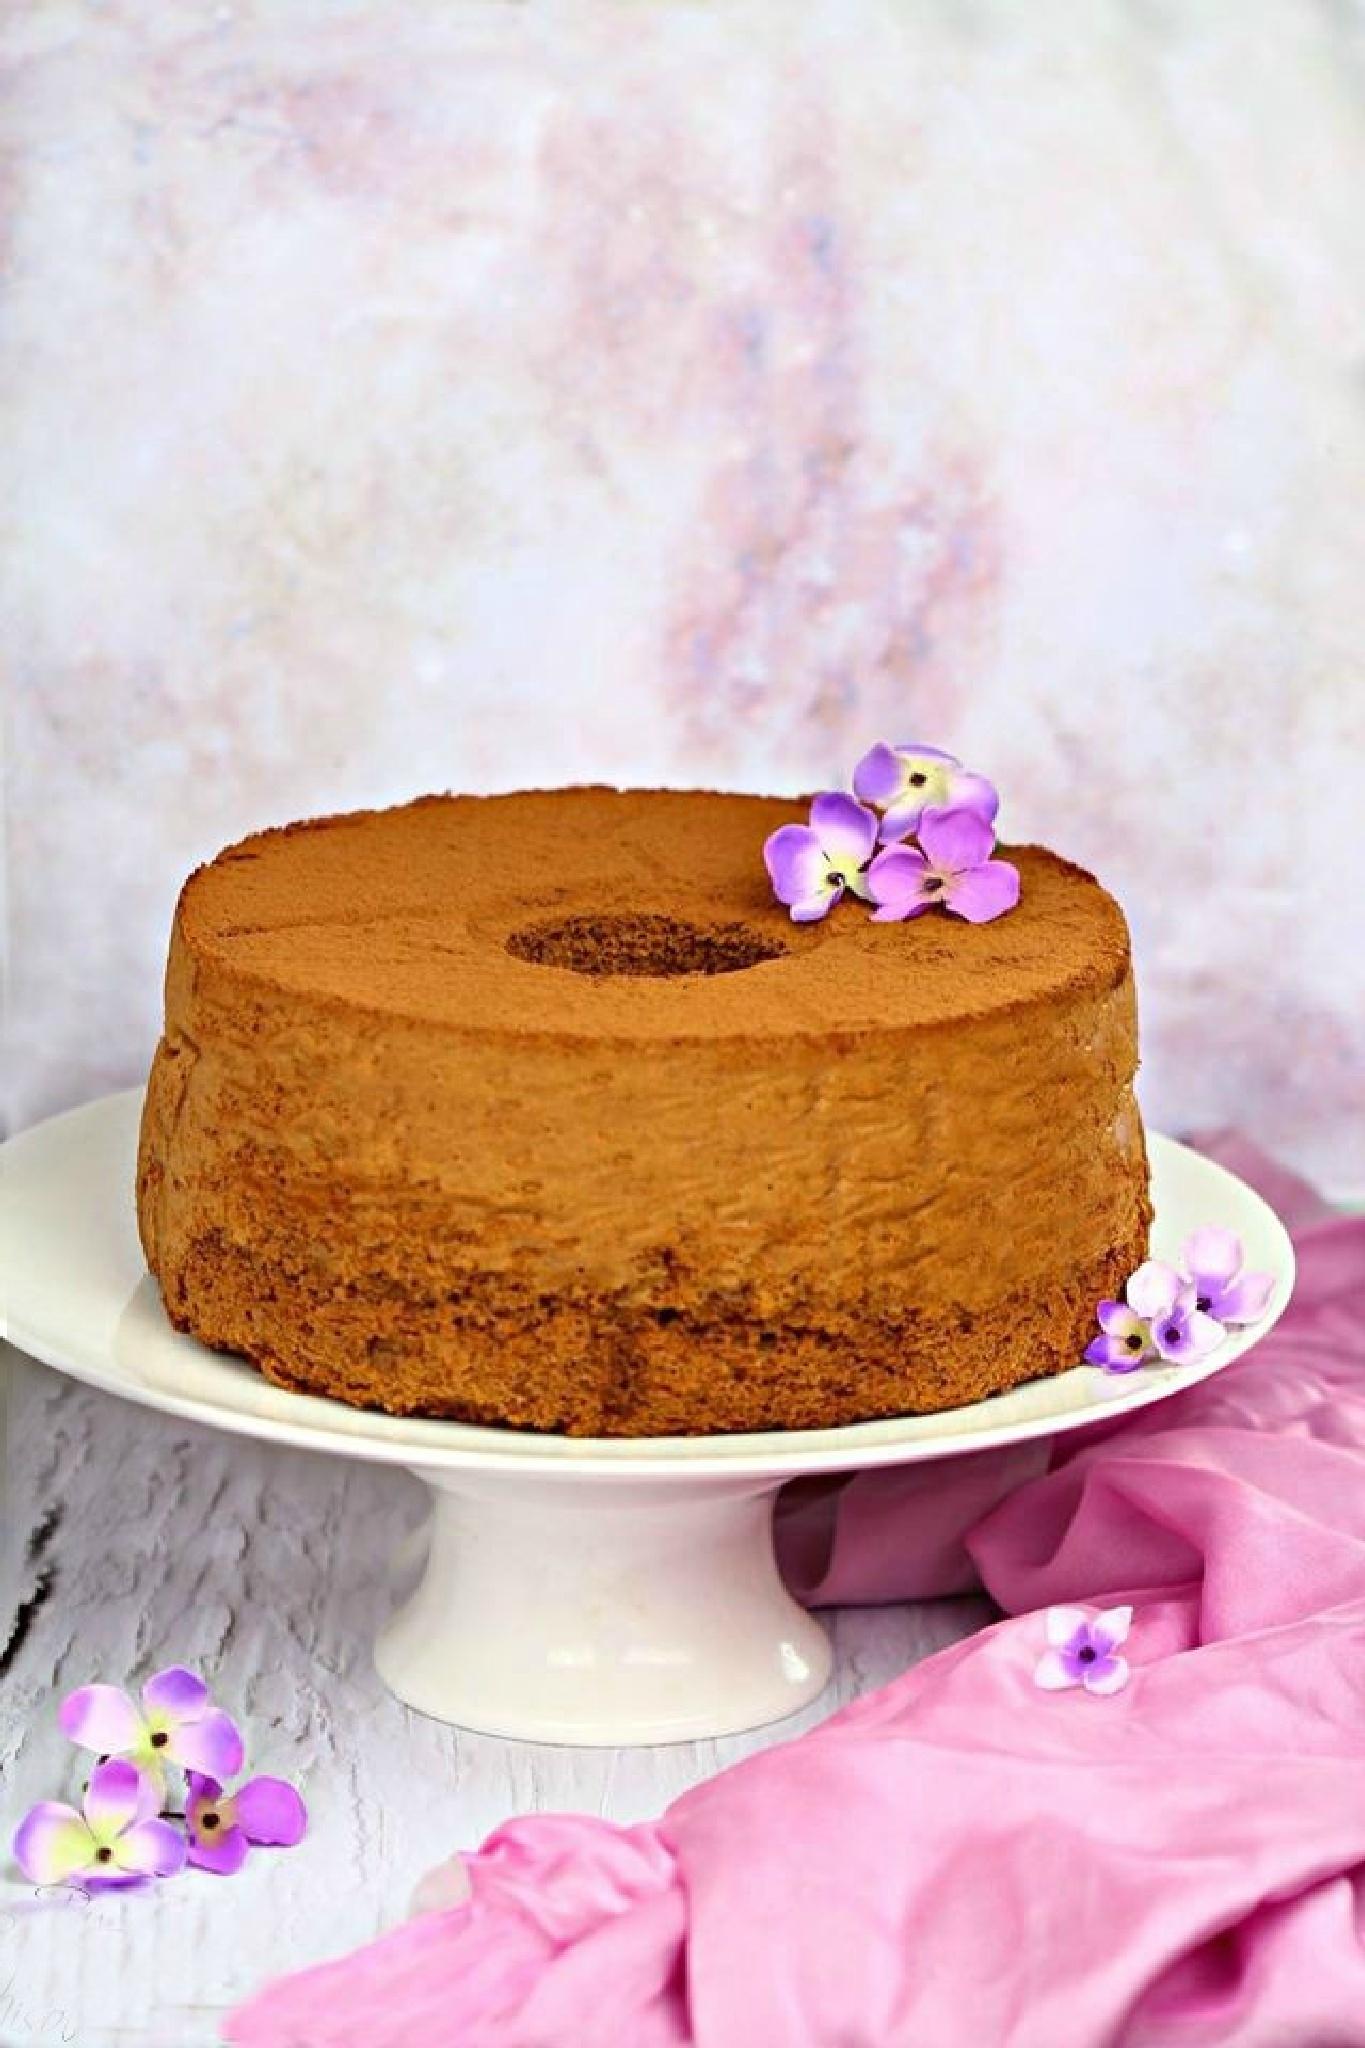 chocolate cake by Nisreen Rahhal